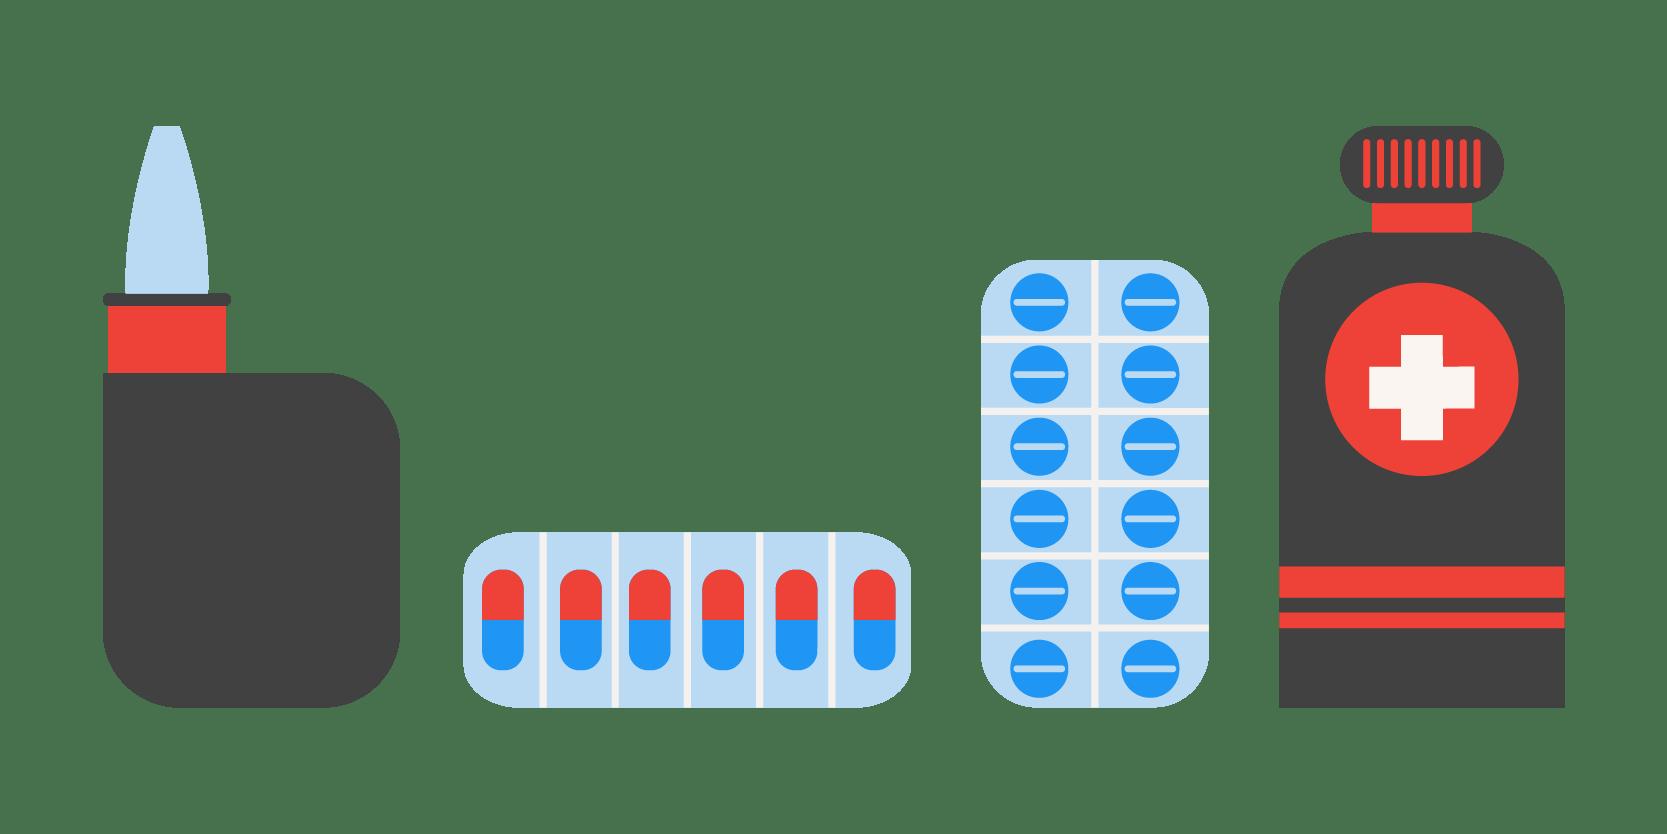 XAXs Covid 19 medicine illustration